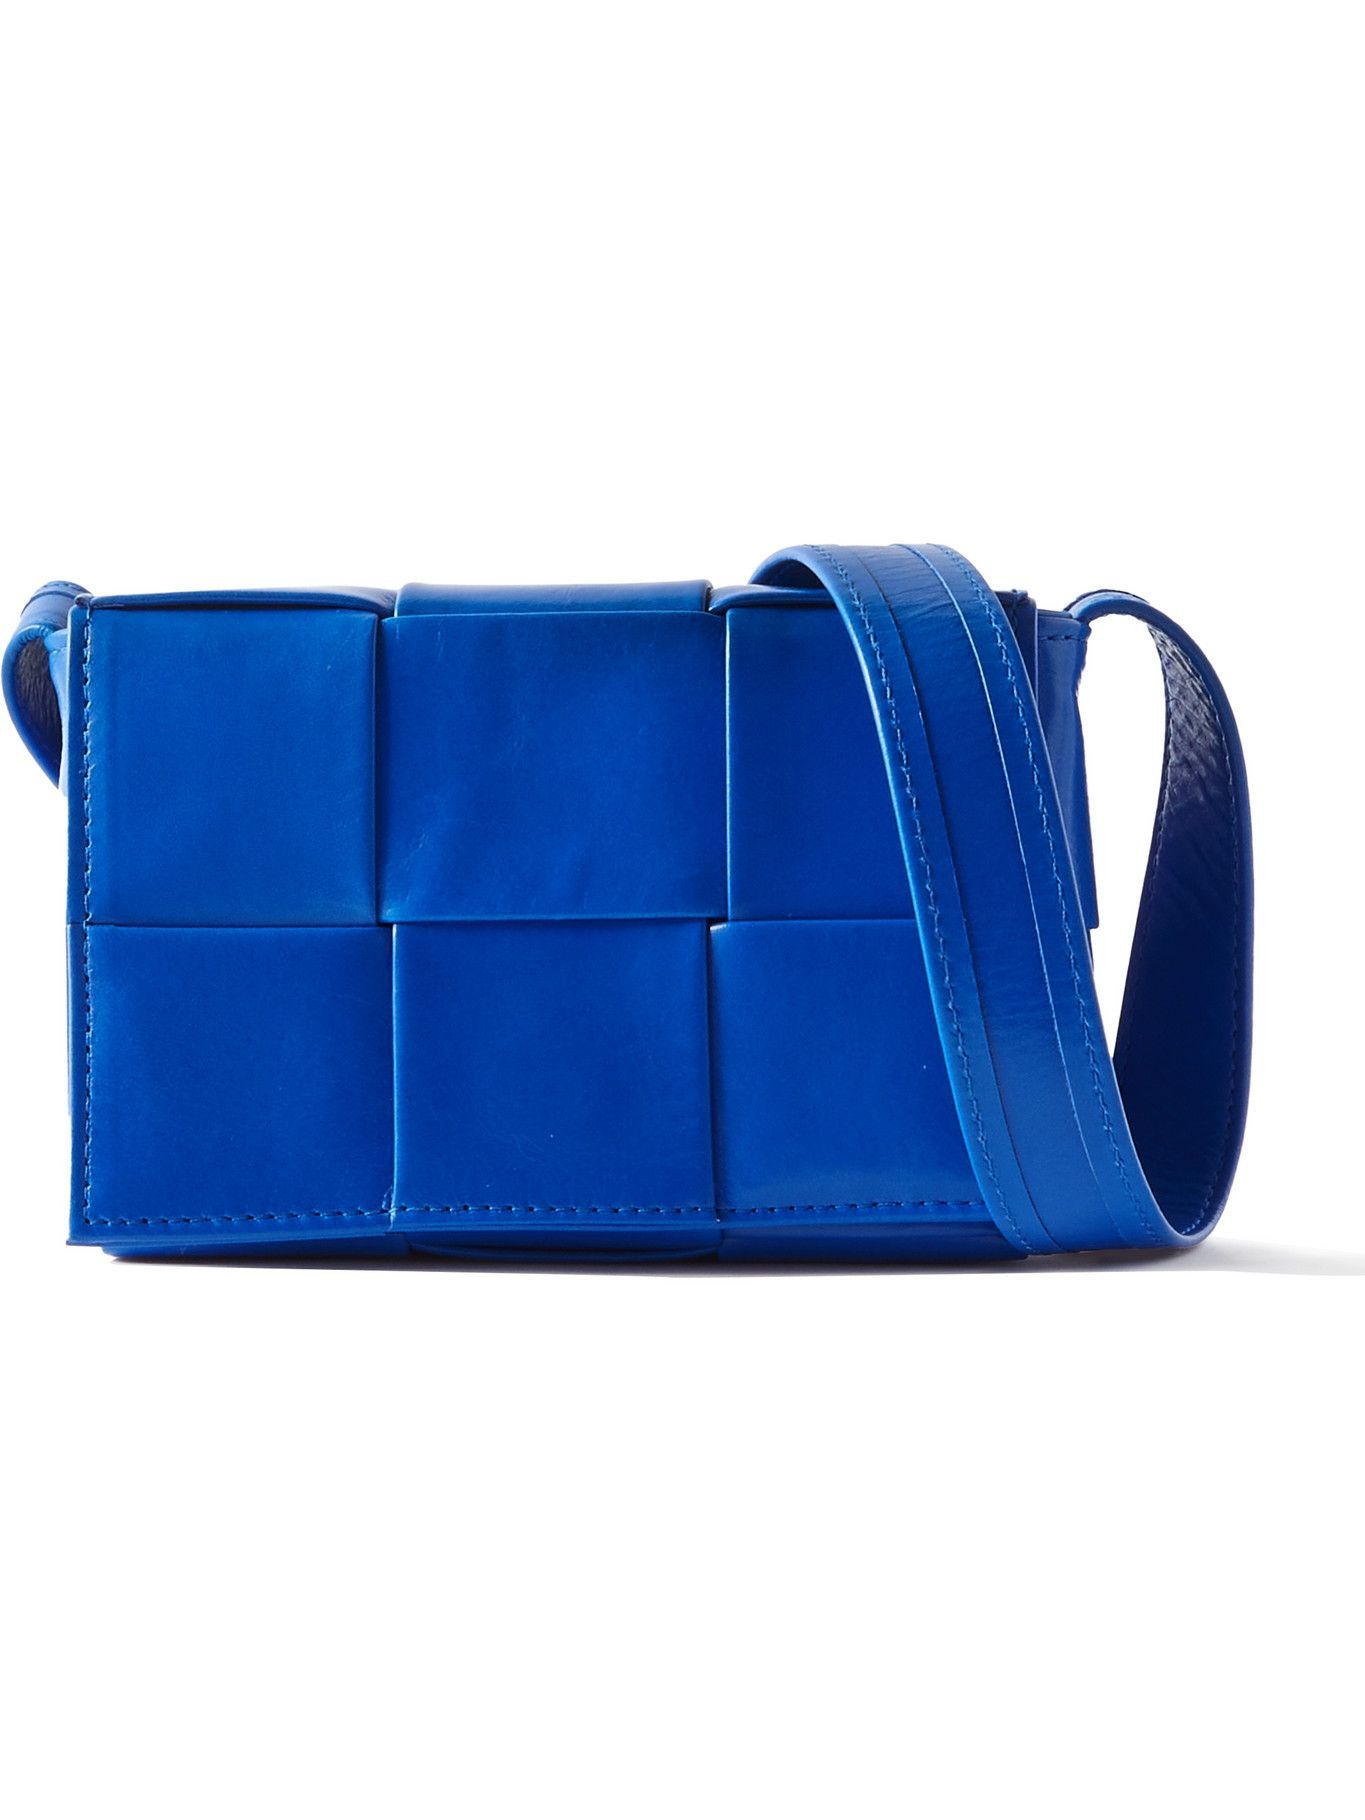 Photo: Bottega Veneta - Intrecciato Leather Messenger Bag